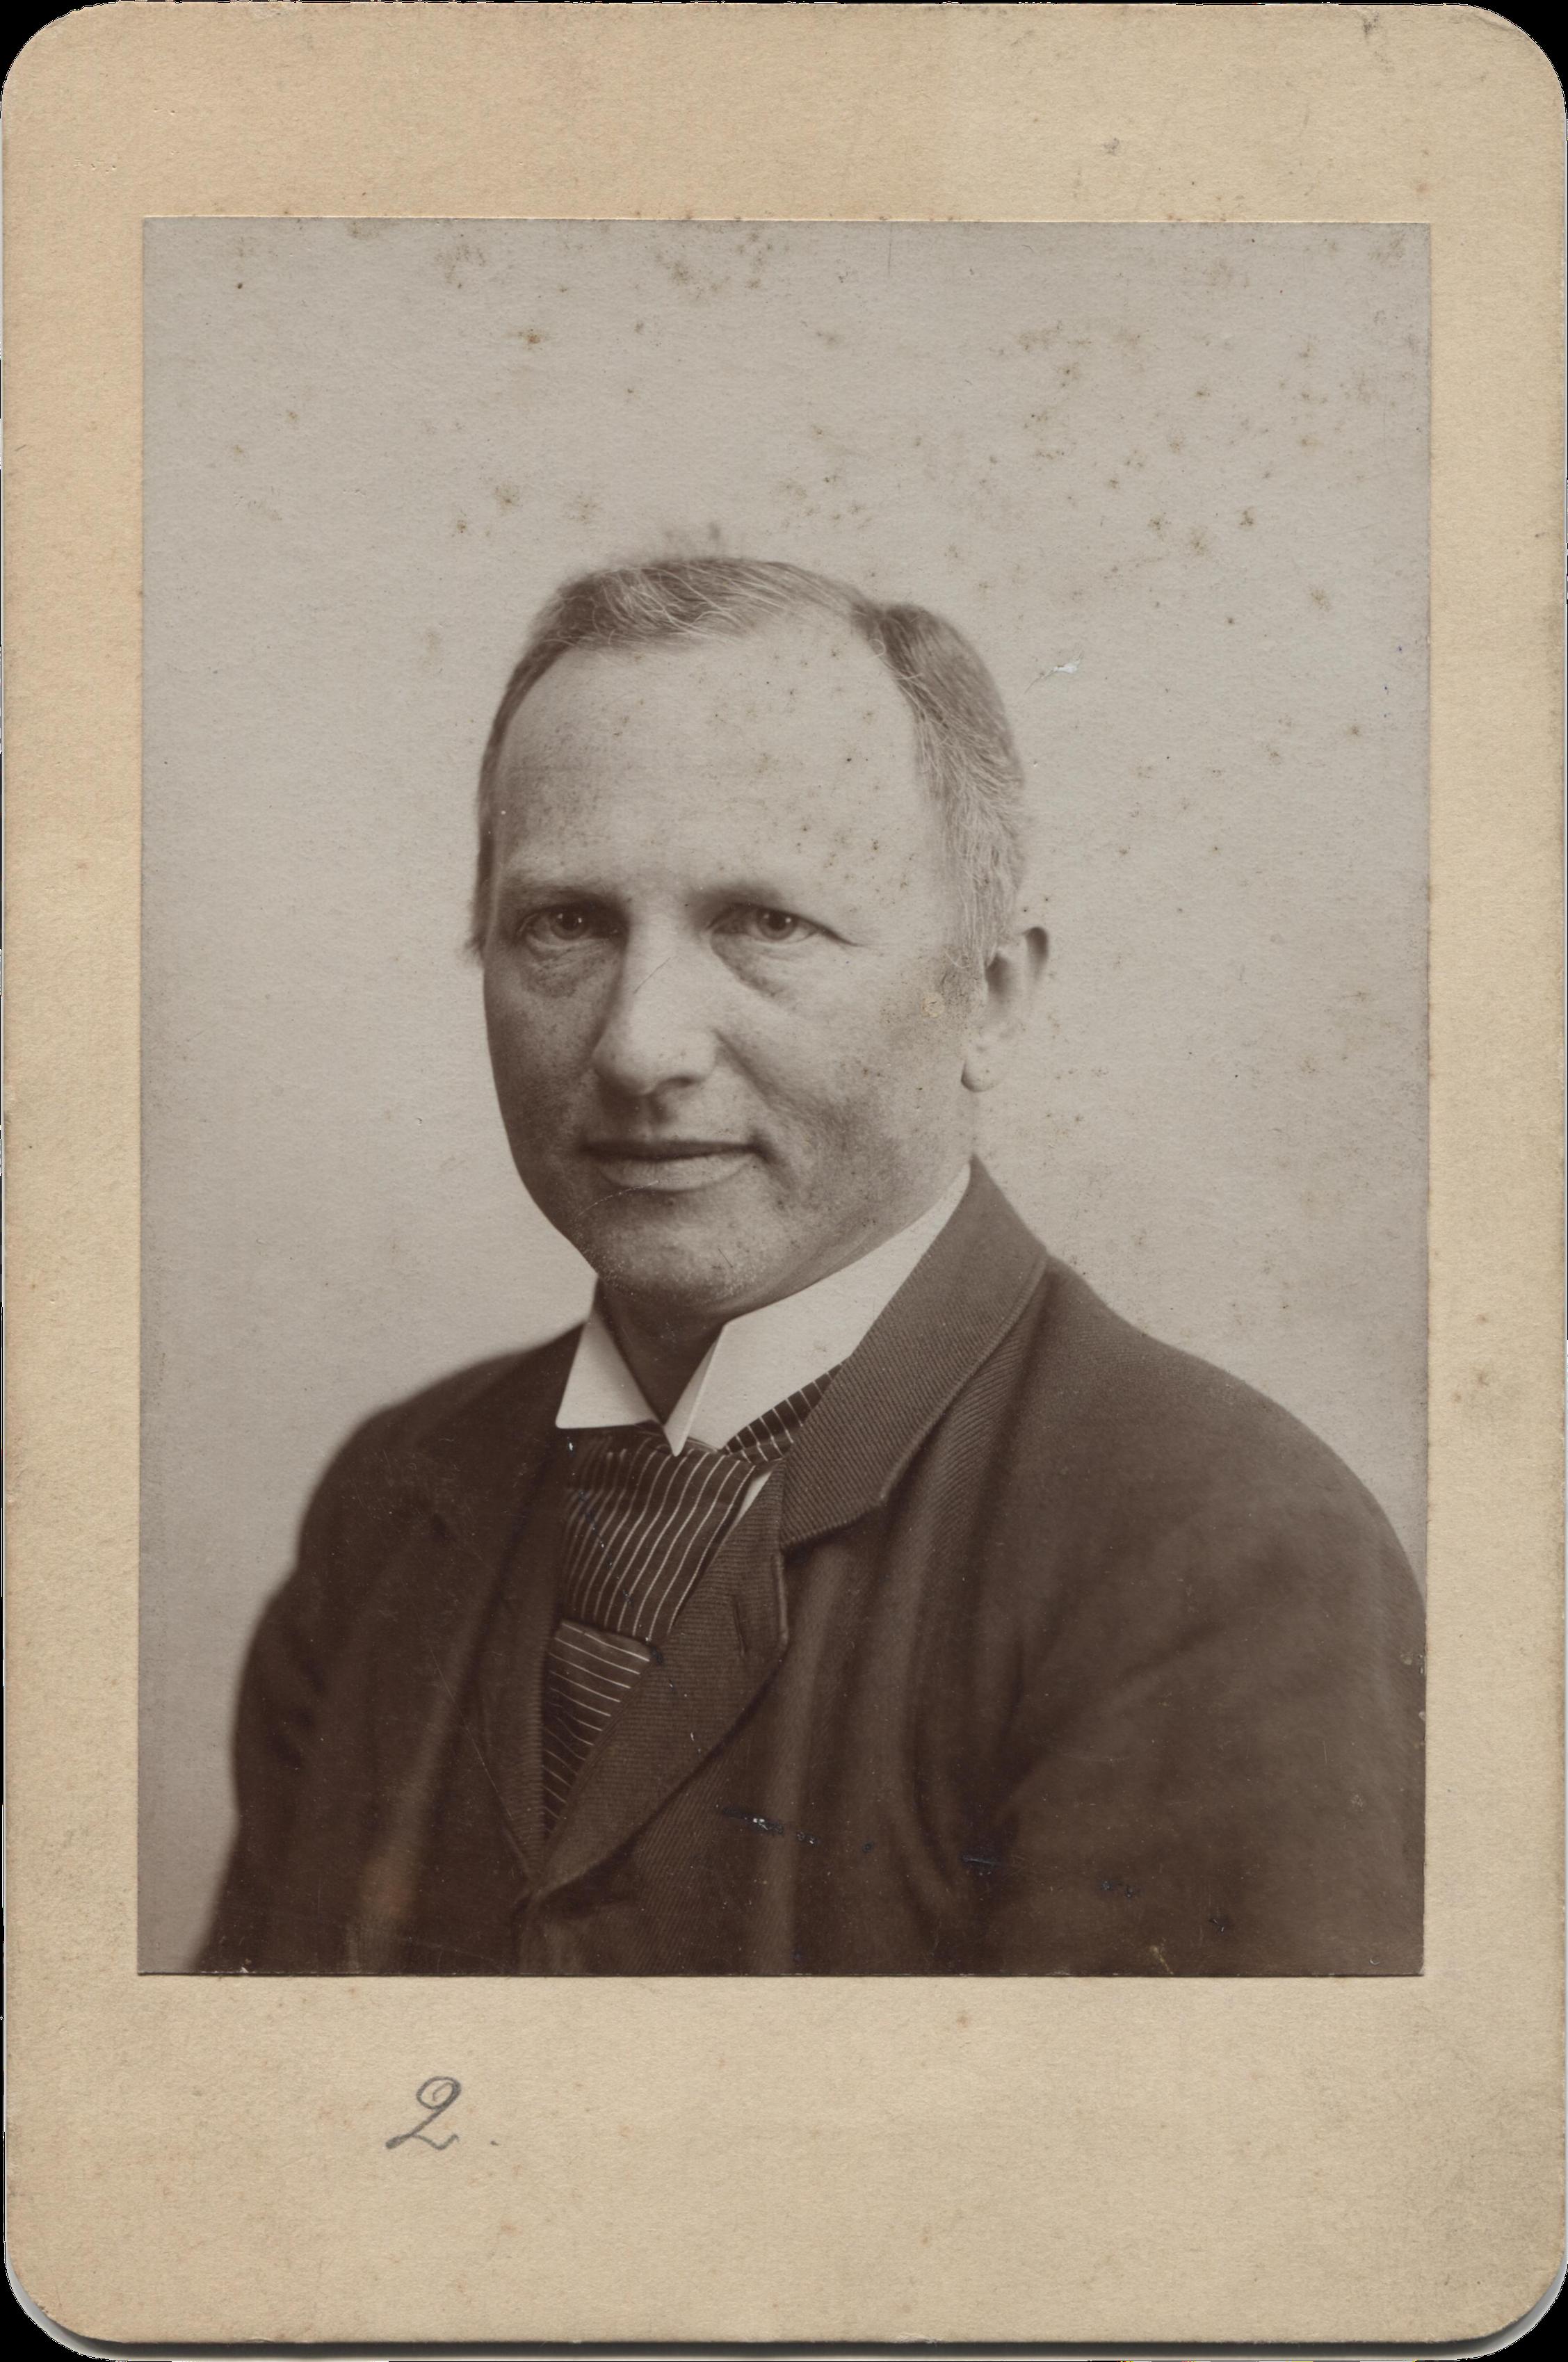 Oskar Panizza, Quelle: Münchner Stadtbibliothek/Monacensia